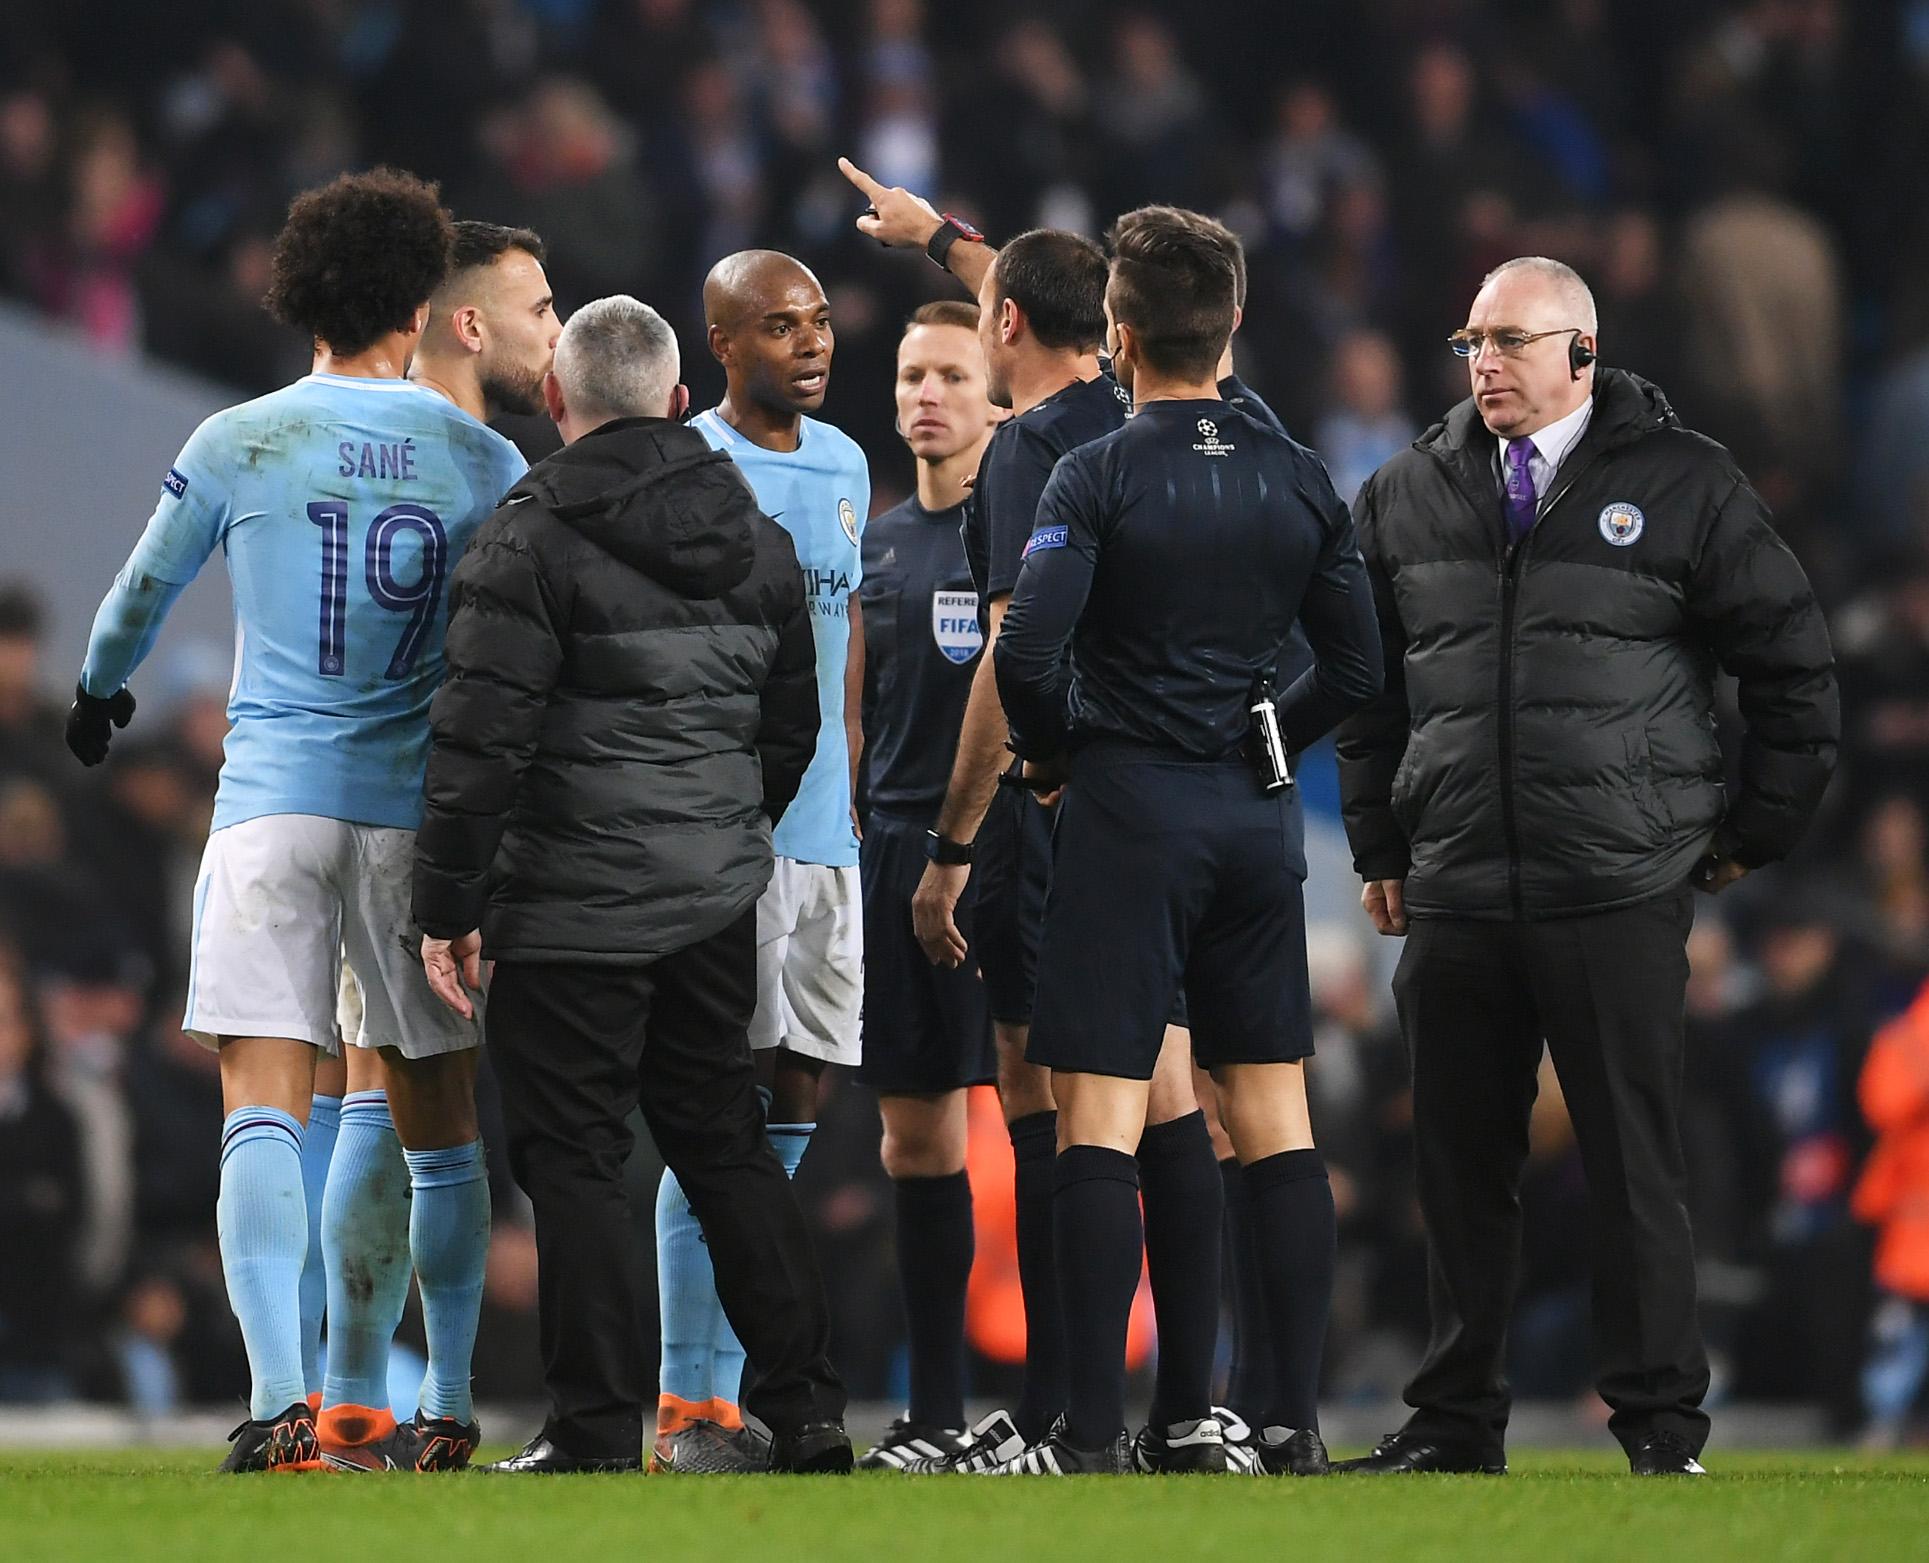 Manchester City v Liverpool- UEFA Champions League Quarter Final Second Leg